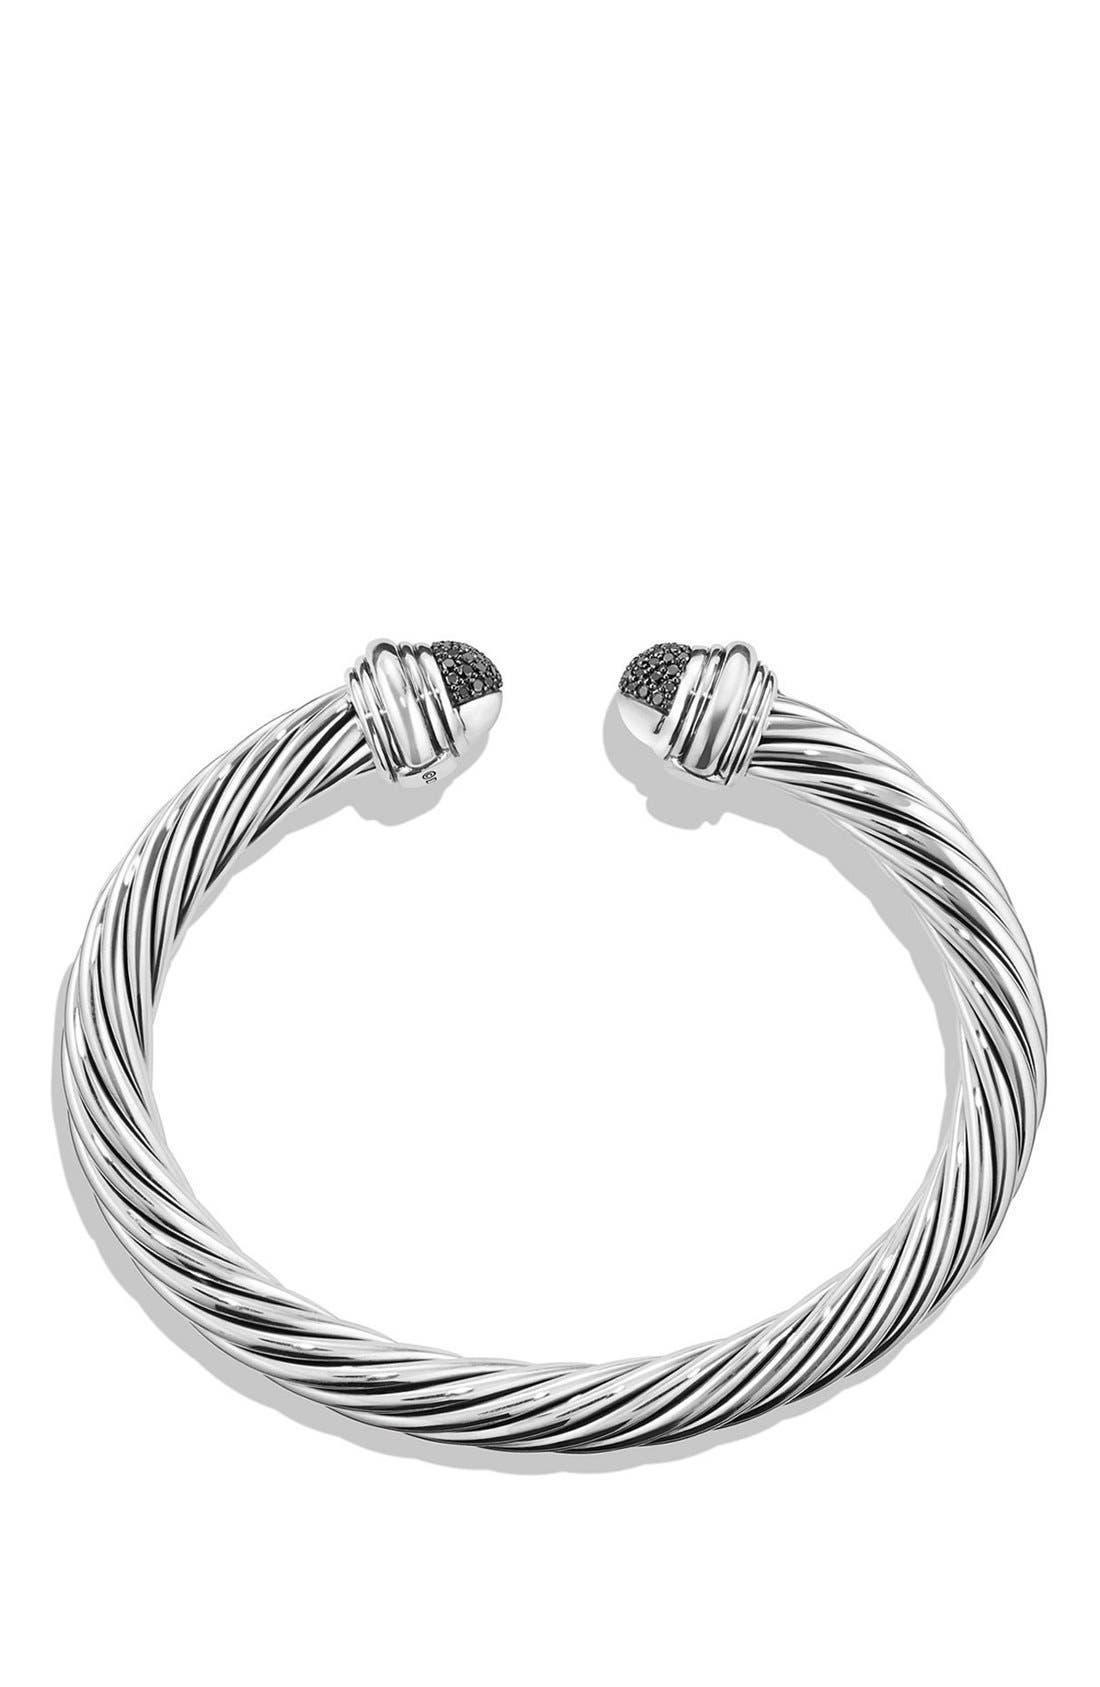 Alternate Image 2  - David Yurman 'Cable Classics' Bracelet with Black Diamonds